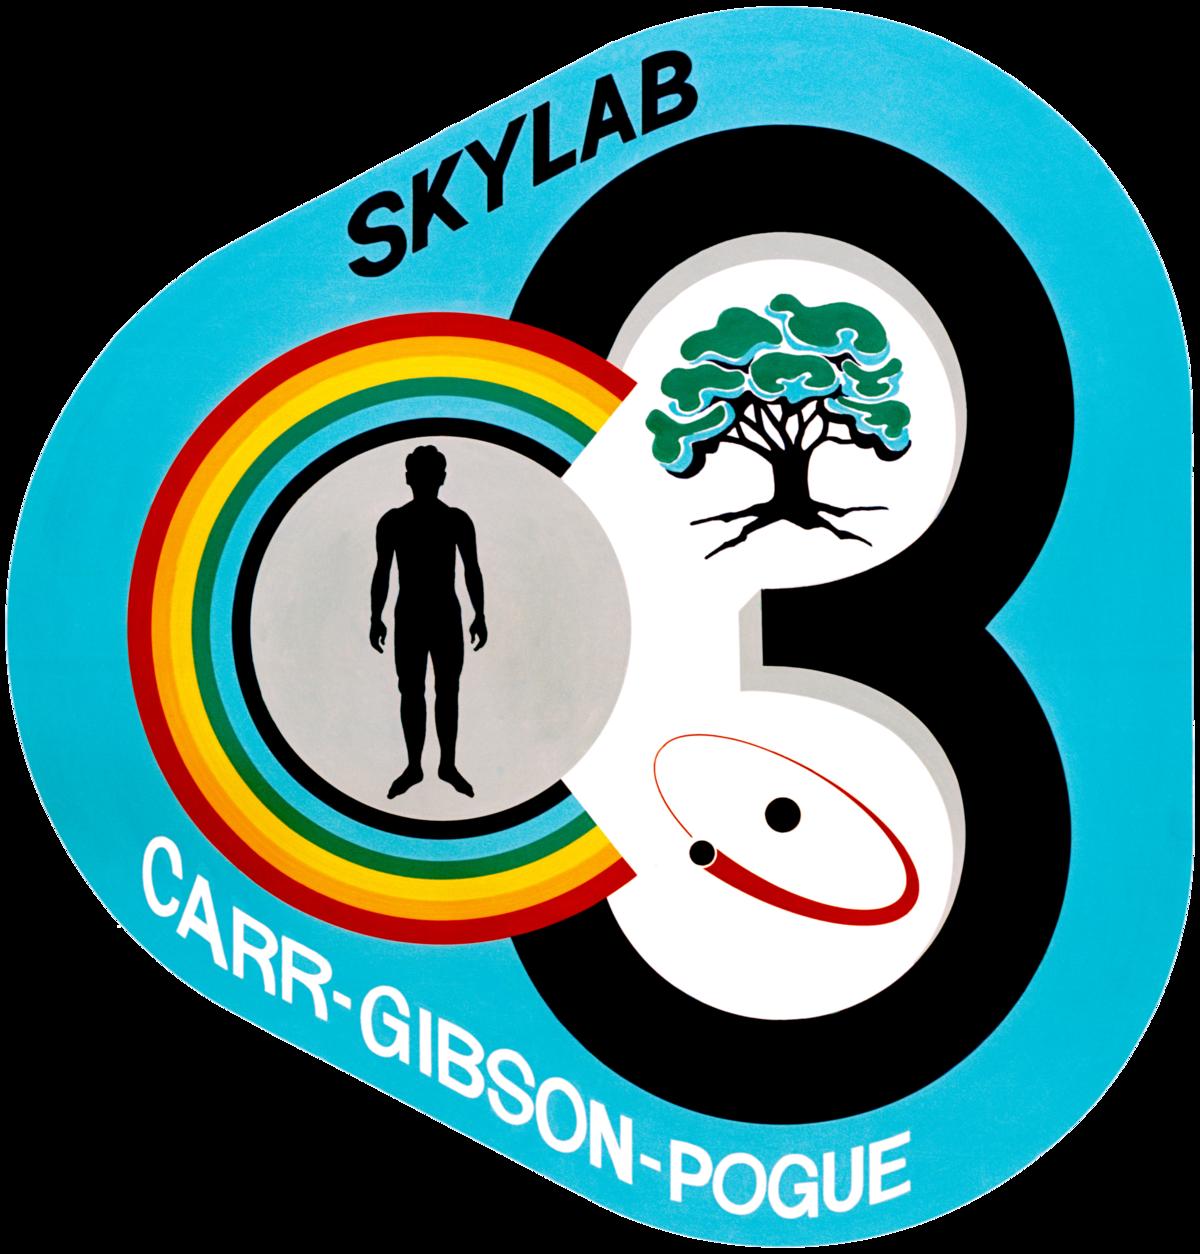 Skylab 4 - Wikipedia, la enciclopedia libre